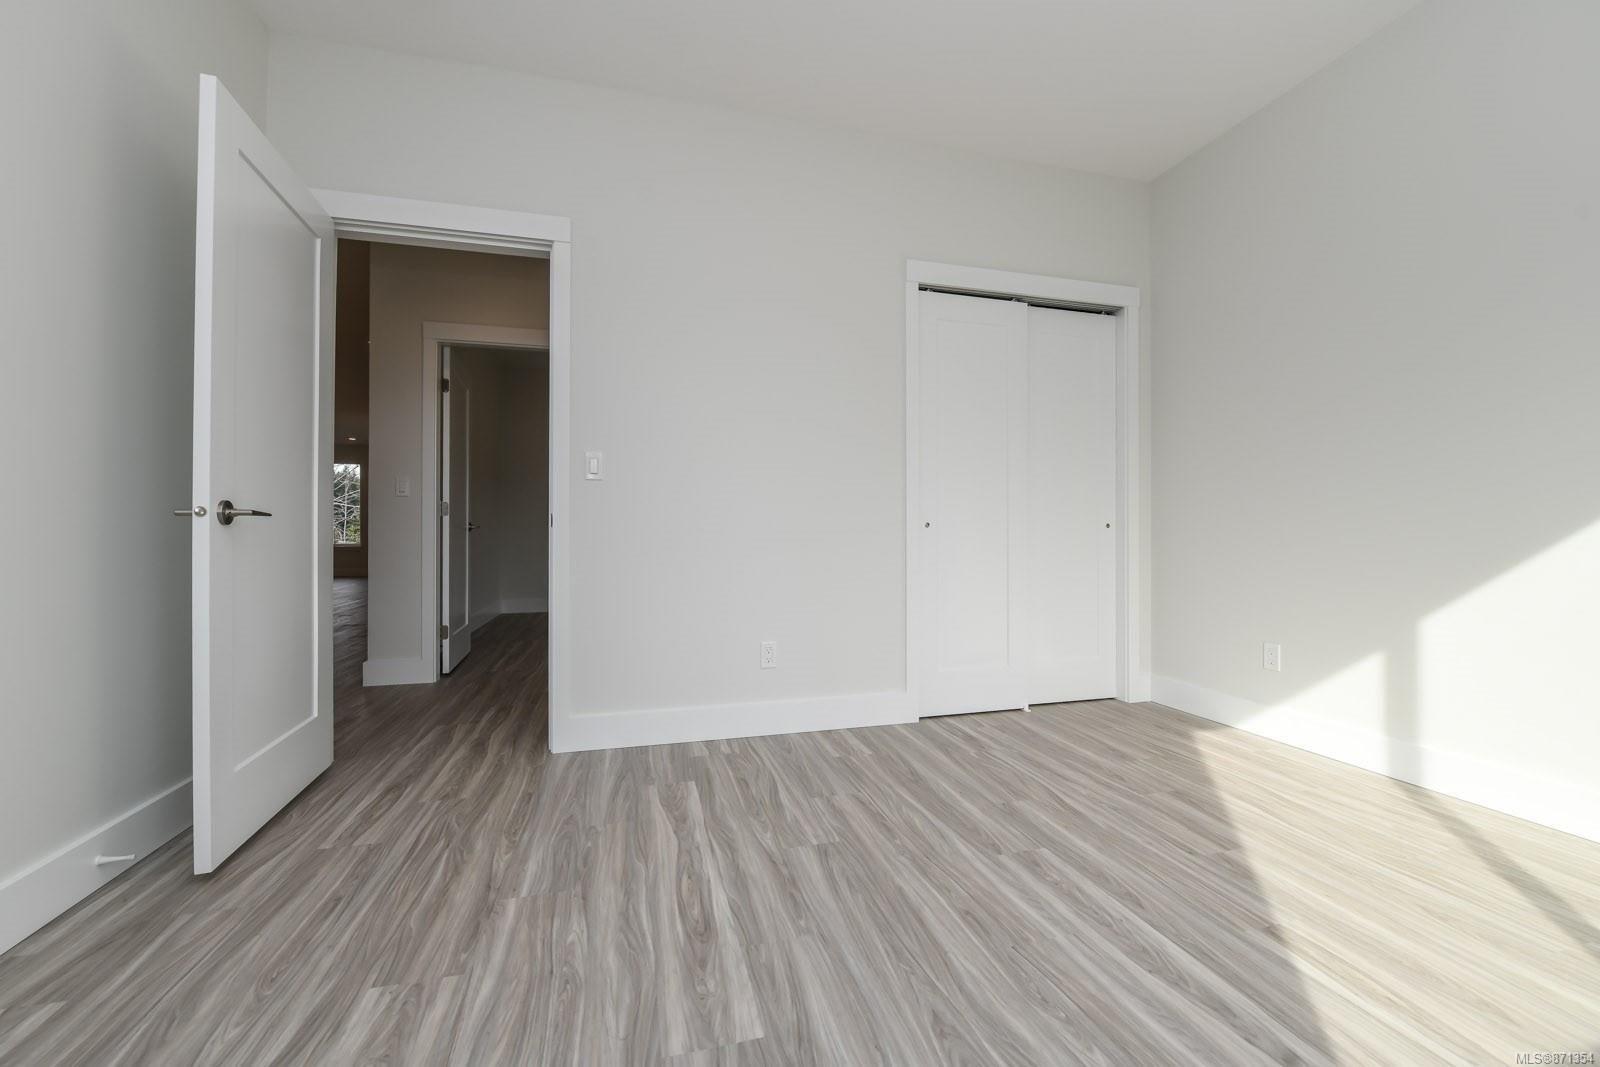 Photo 18: Photos: 68 Grayhawk Pl in : CV Courtenay City House for sale (Comox Valley)  : MLS®# 871354